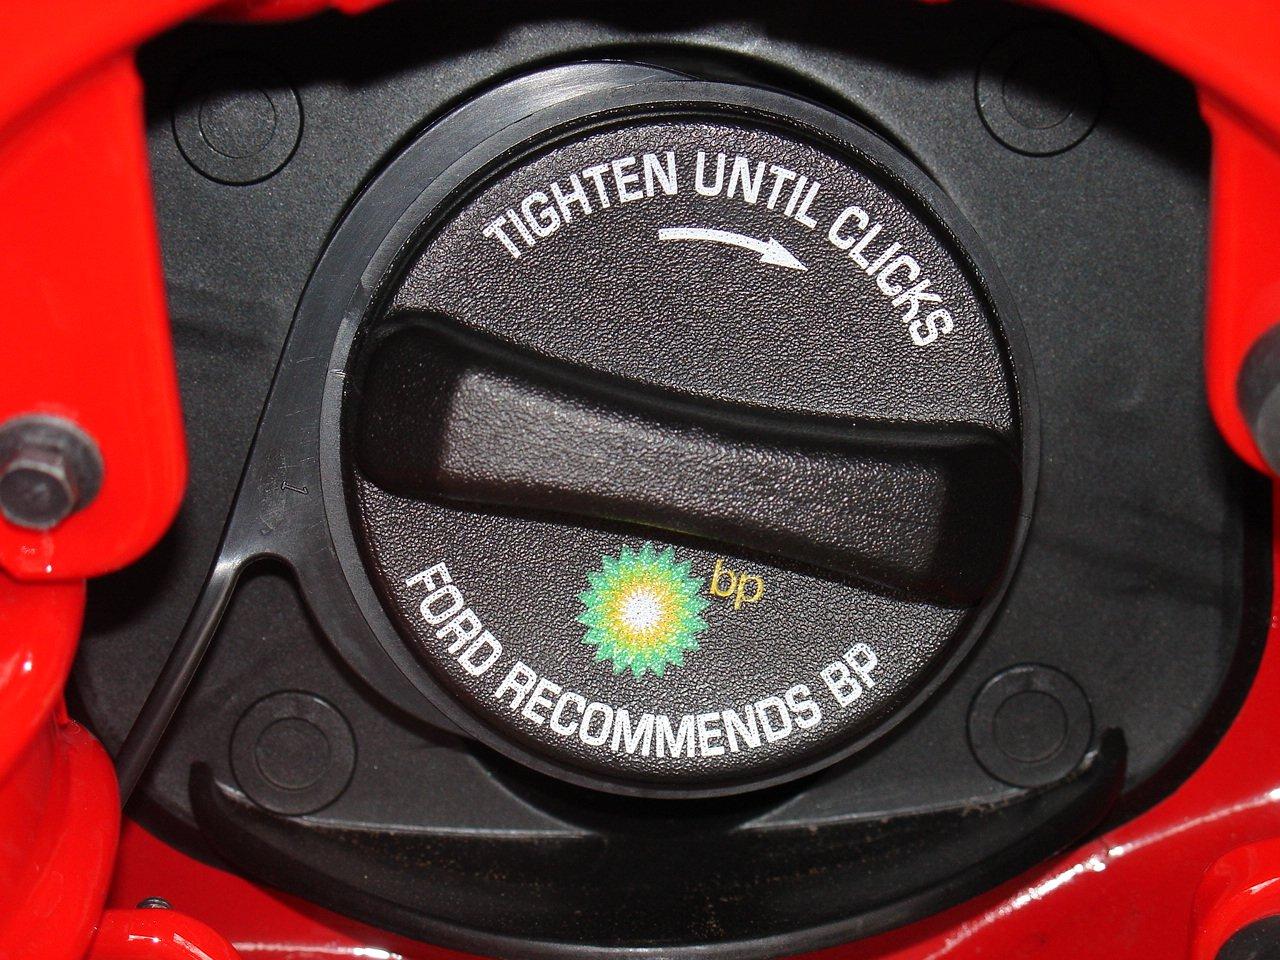 Automotive Gas Cap : Son of dexos coming bob is the oil guy